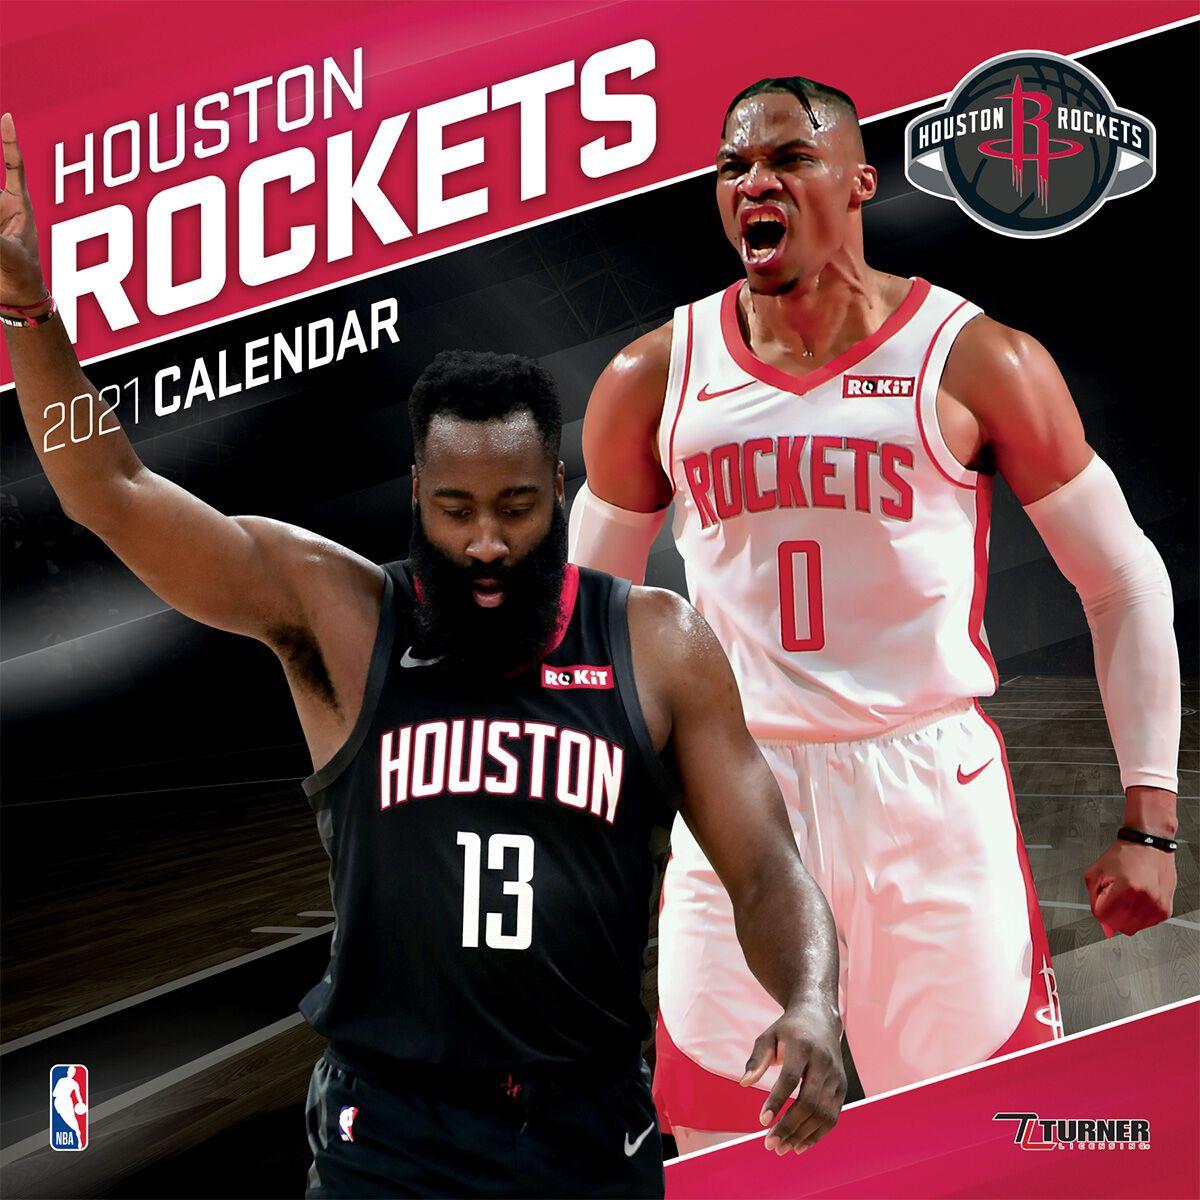 Houston Rockets   Calendar 2021   NBA Wall Calendar   EMP